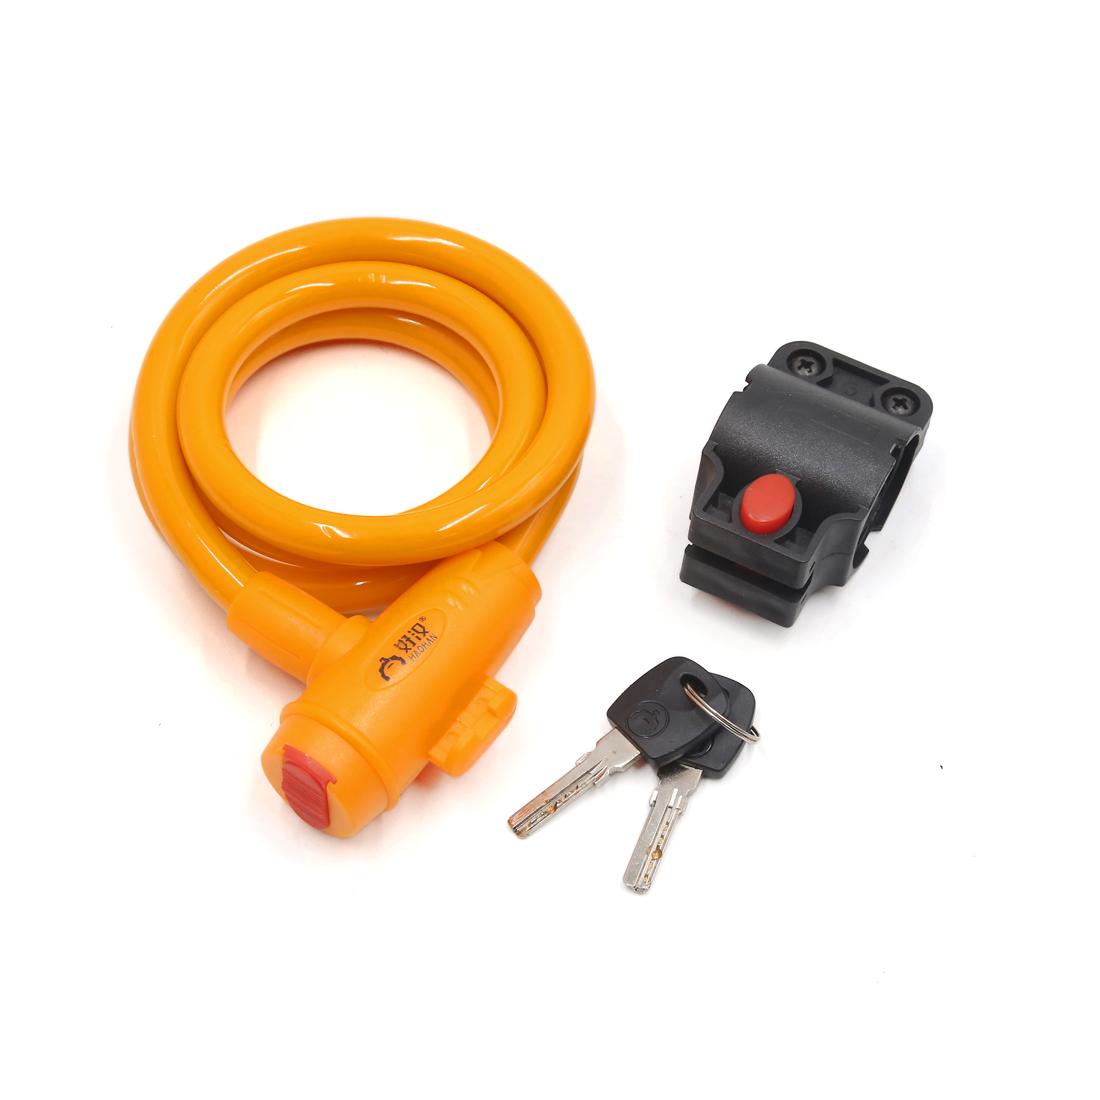 Universal Bike Bicycle Orange Anti Thief Safety Cable Wire Lock w 2 Keys